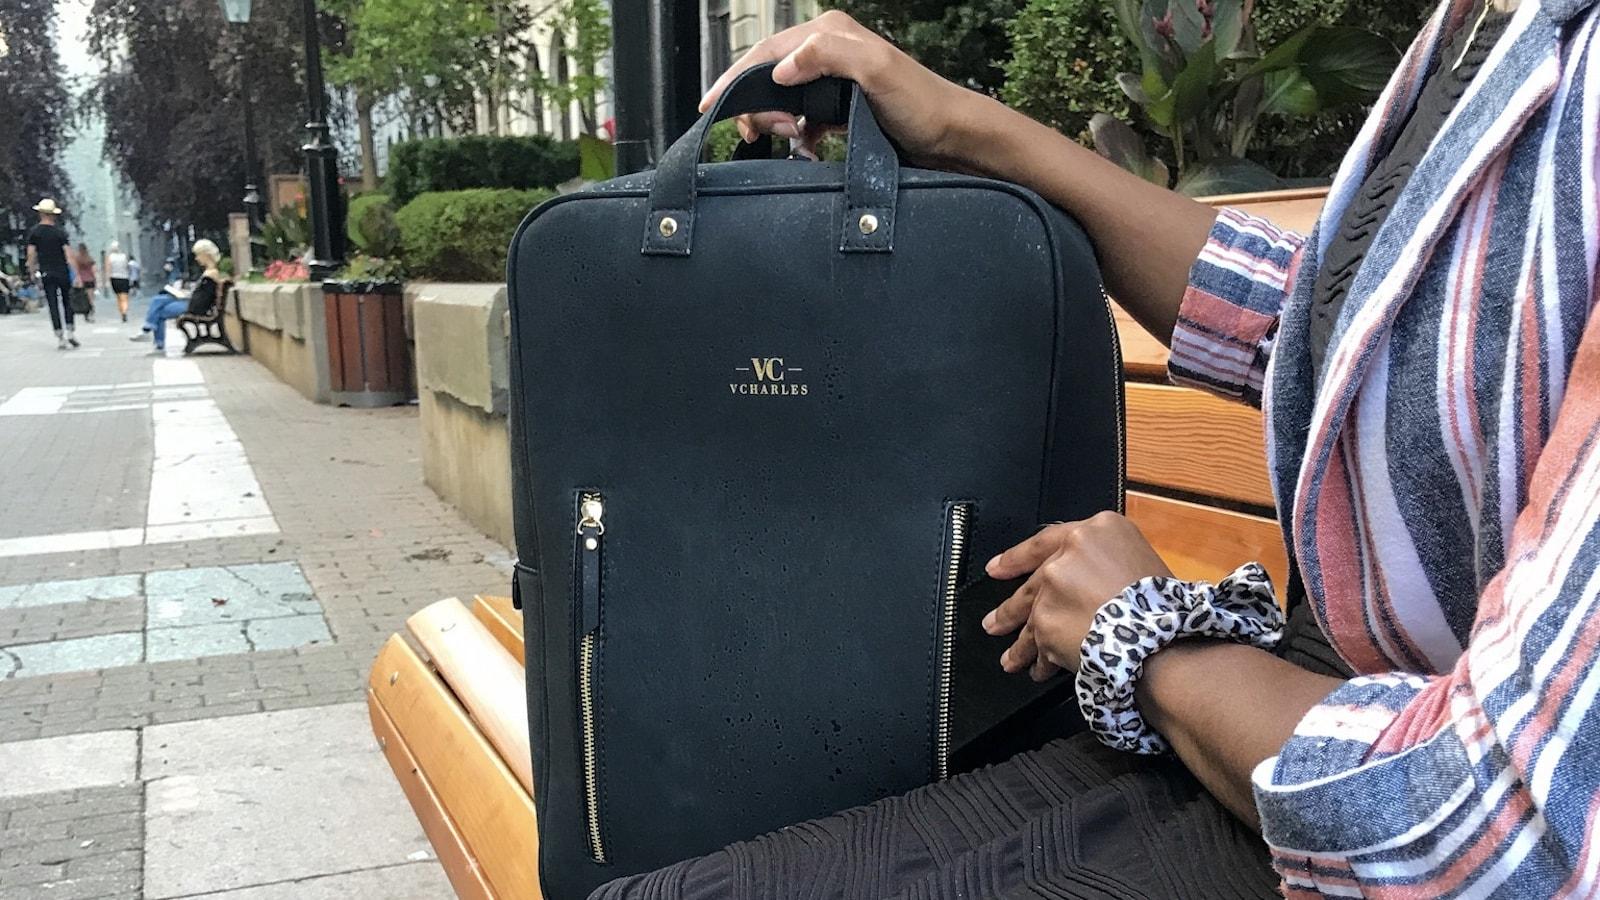 VCharles vegan cork bag has the versatility and organization that modern women need